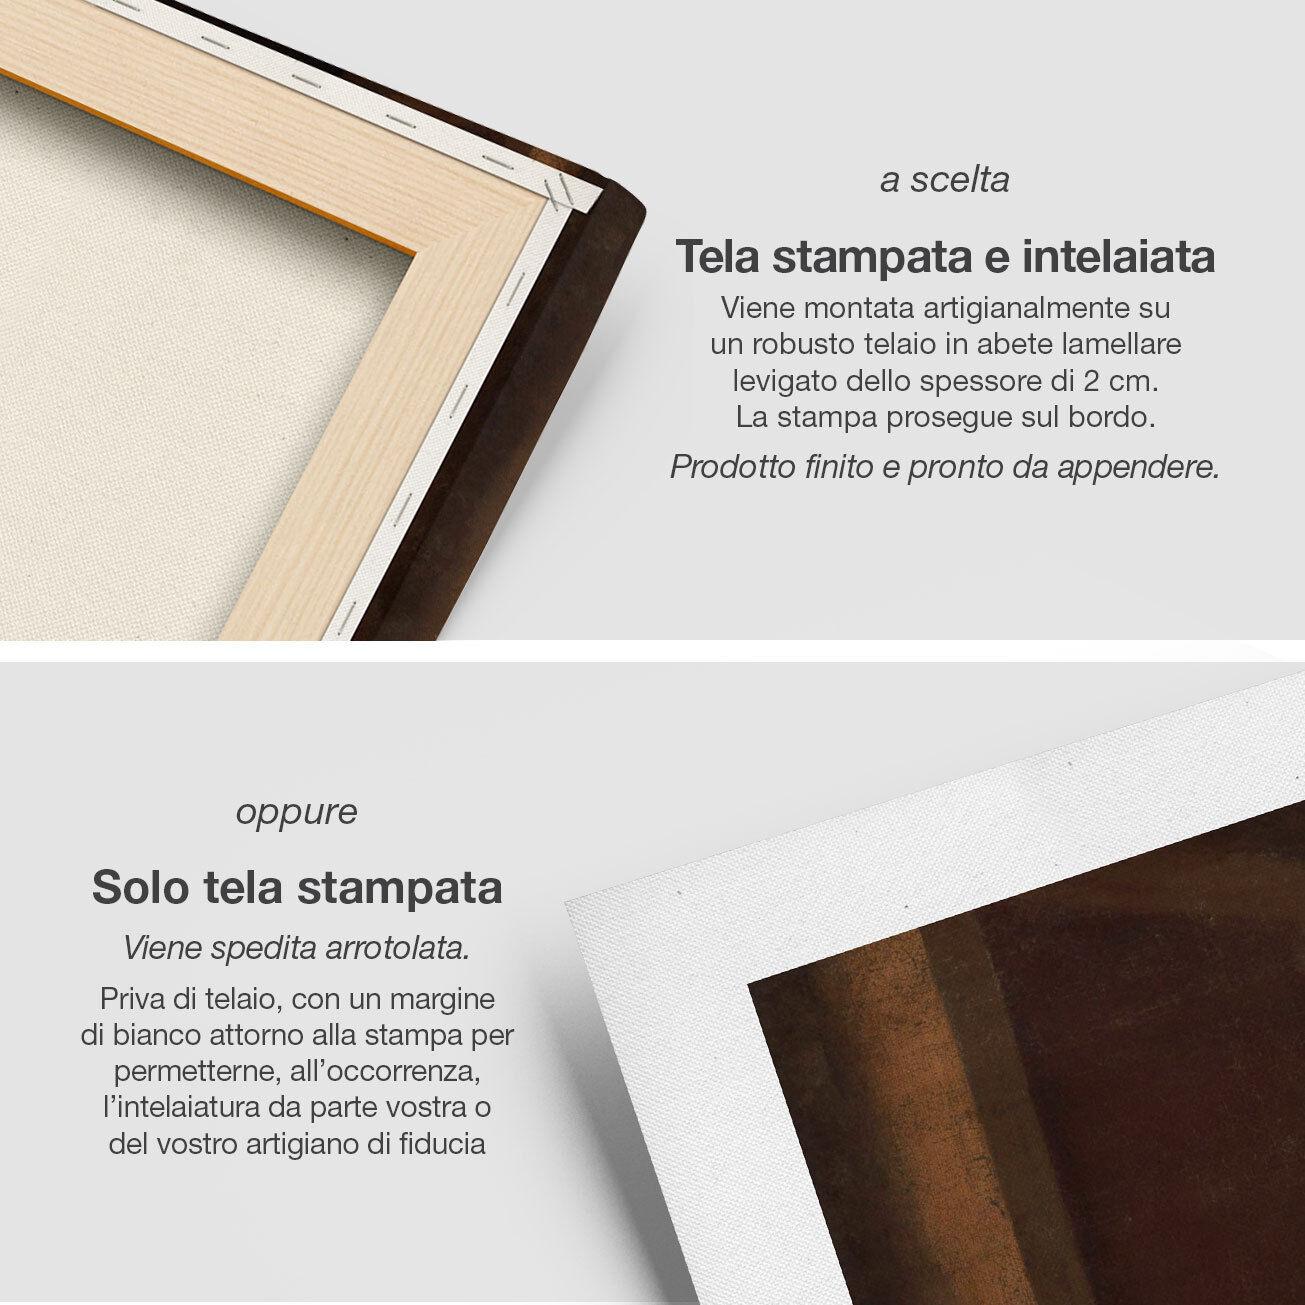 B.E. Murillo, Galiziane Galiziane Galiziane alla finestra - Stampa Giclée su tela Canvas Fine Art HR a0dd6b